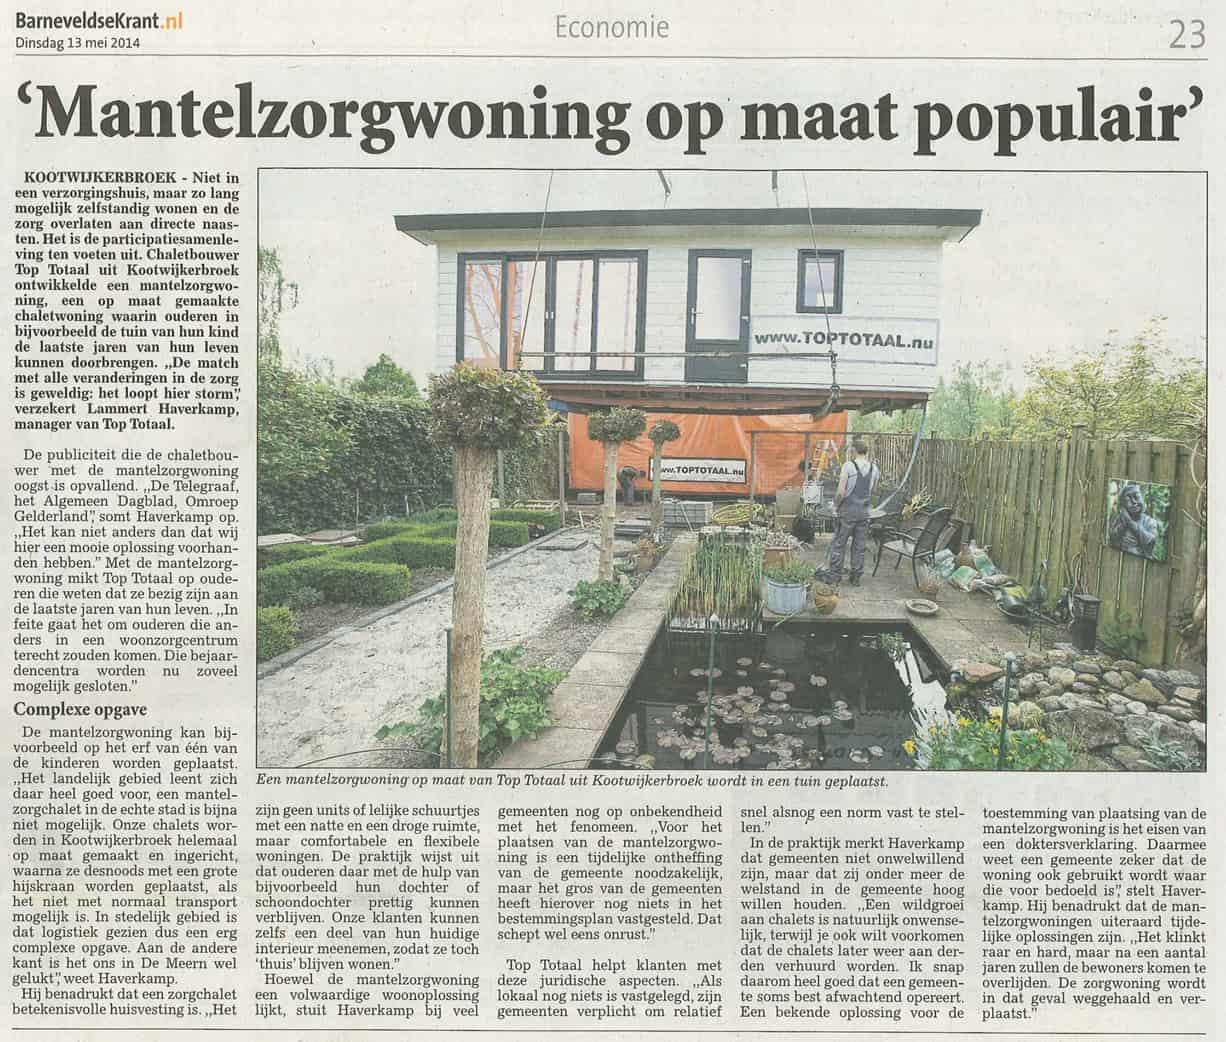 Barneveldse Krant Mantelzorgwoning op maat populair